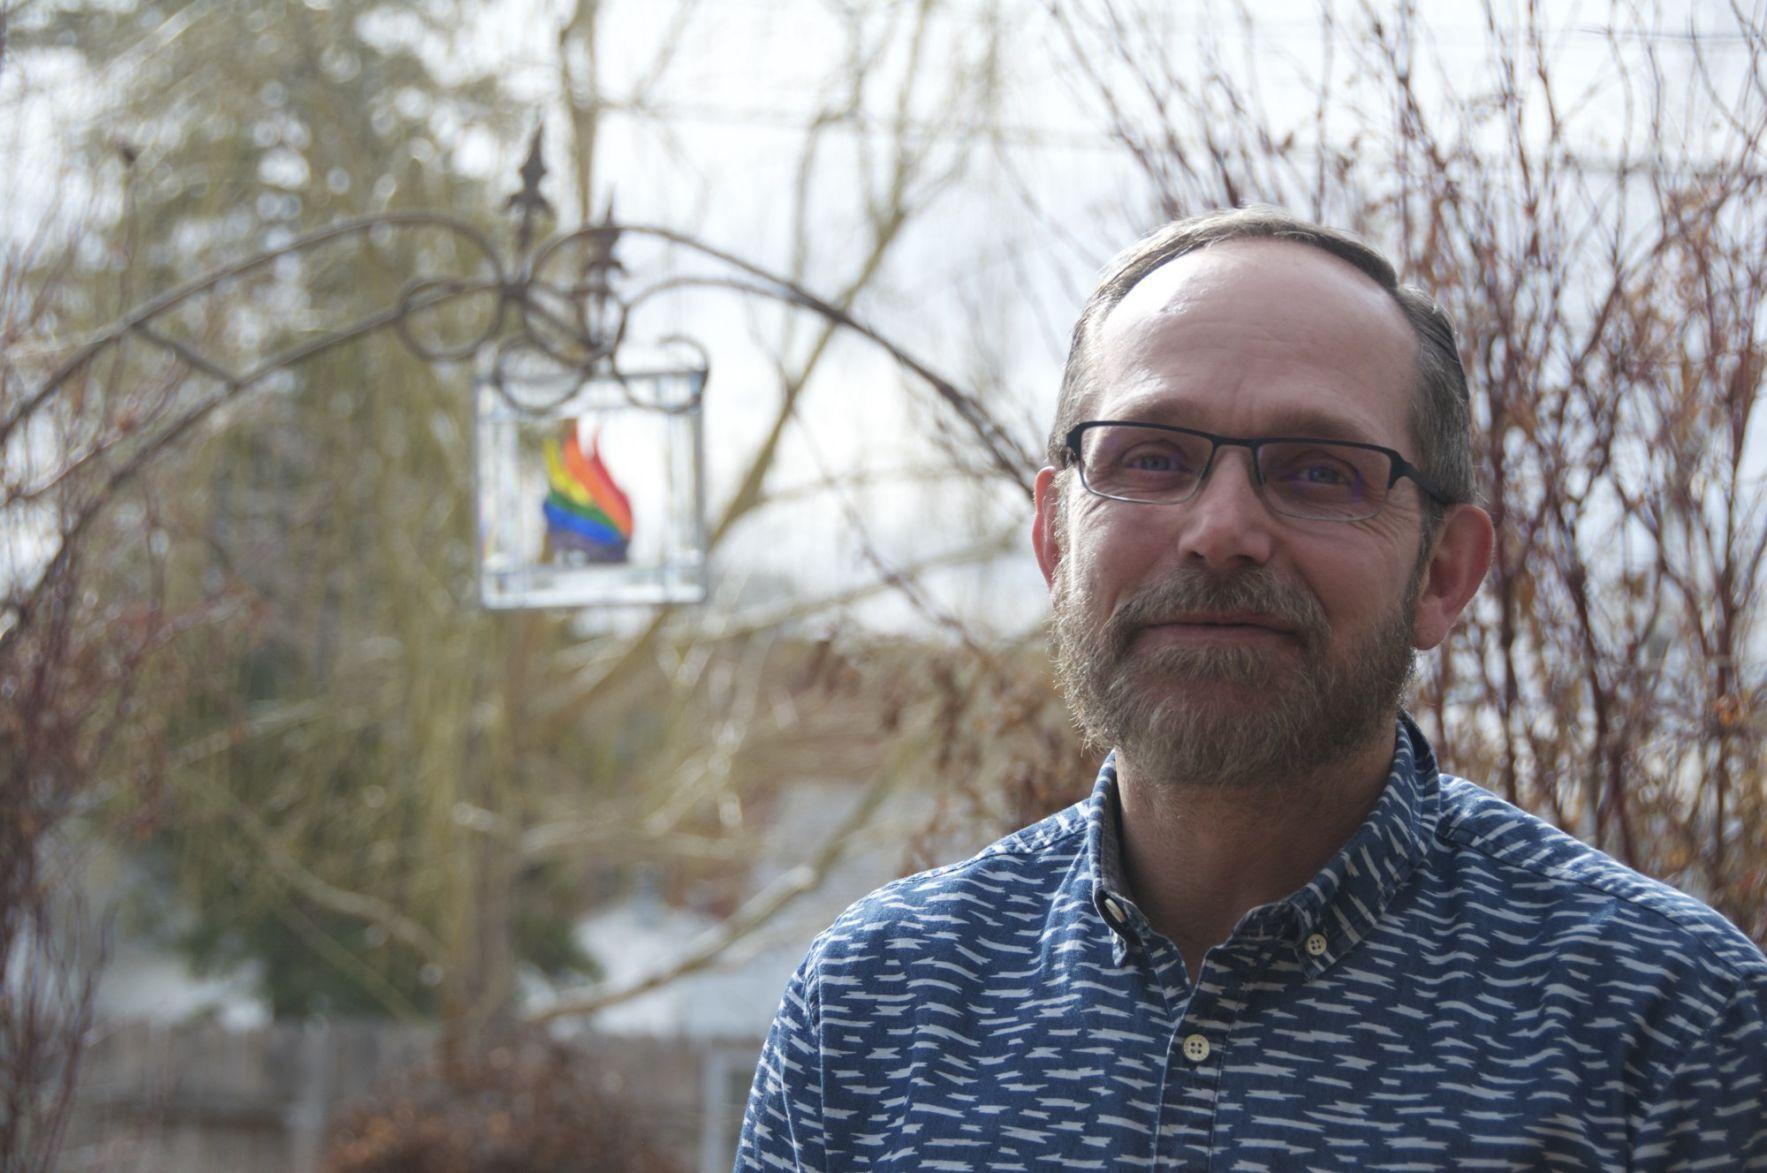 Gay sex now missoula montana